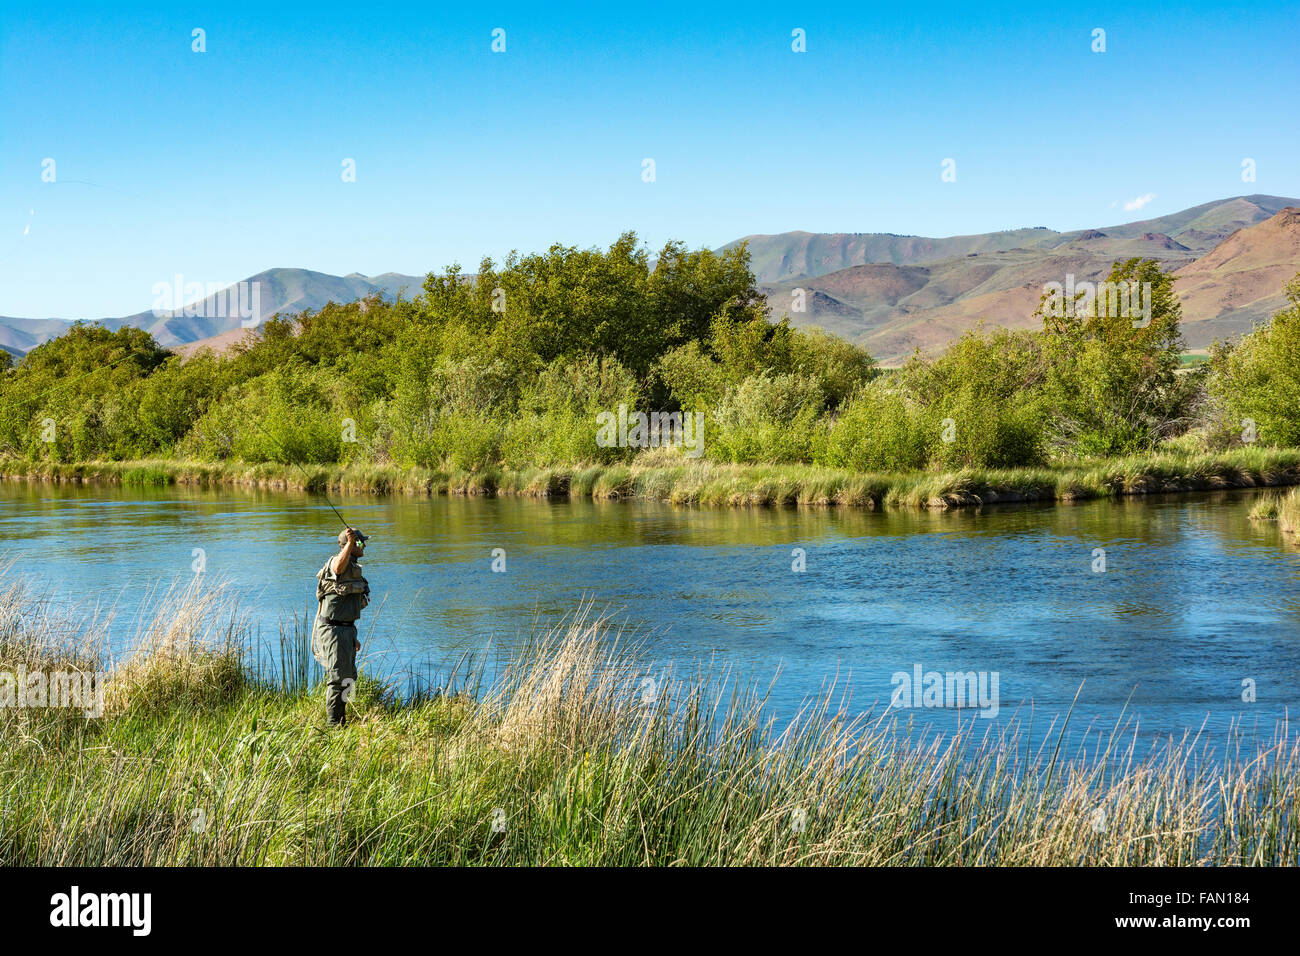 Idaho, Bellevue, Silver Creek Preserve, fly fisherman trout fishing - Stock Image